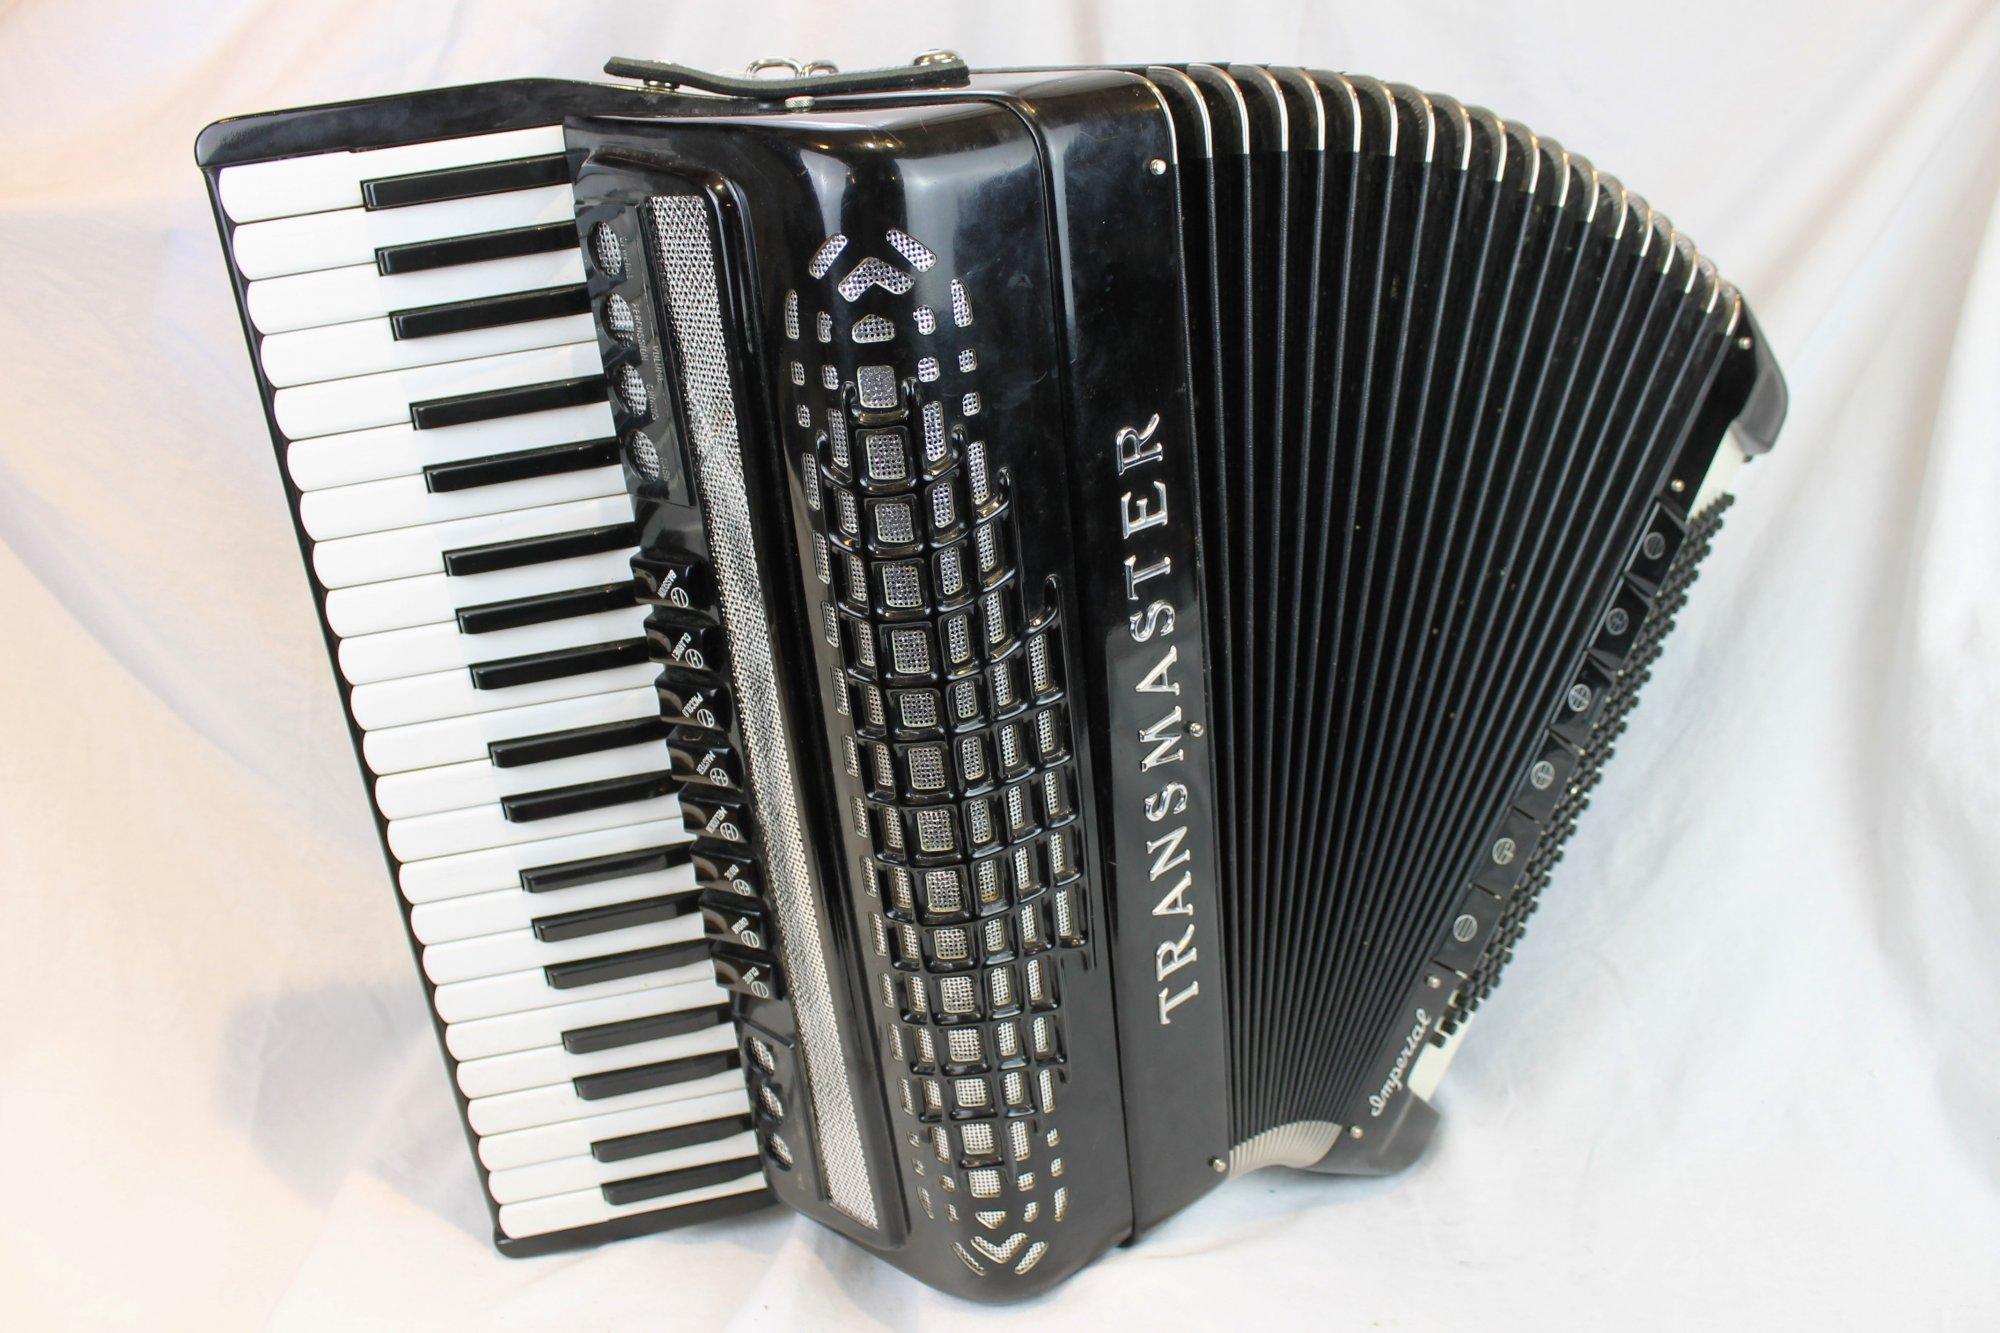 3838 - Black Imperial Transmaster Piano Accordion LMH 41 120